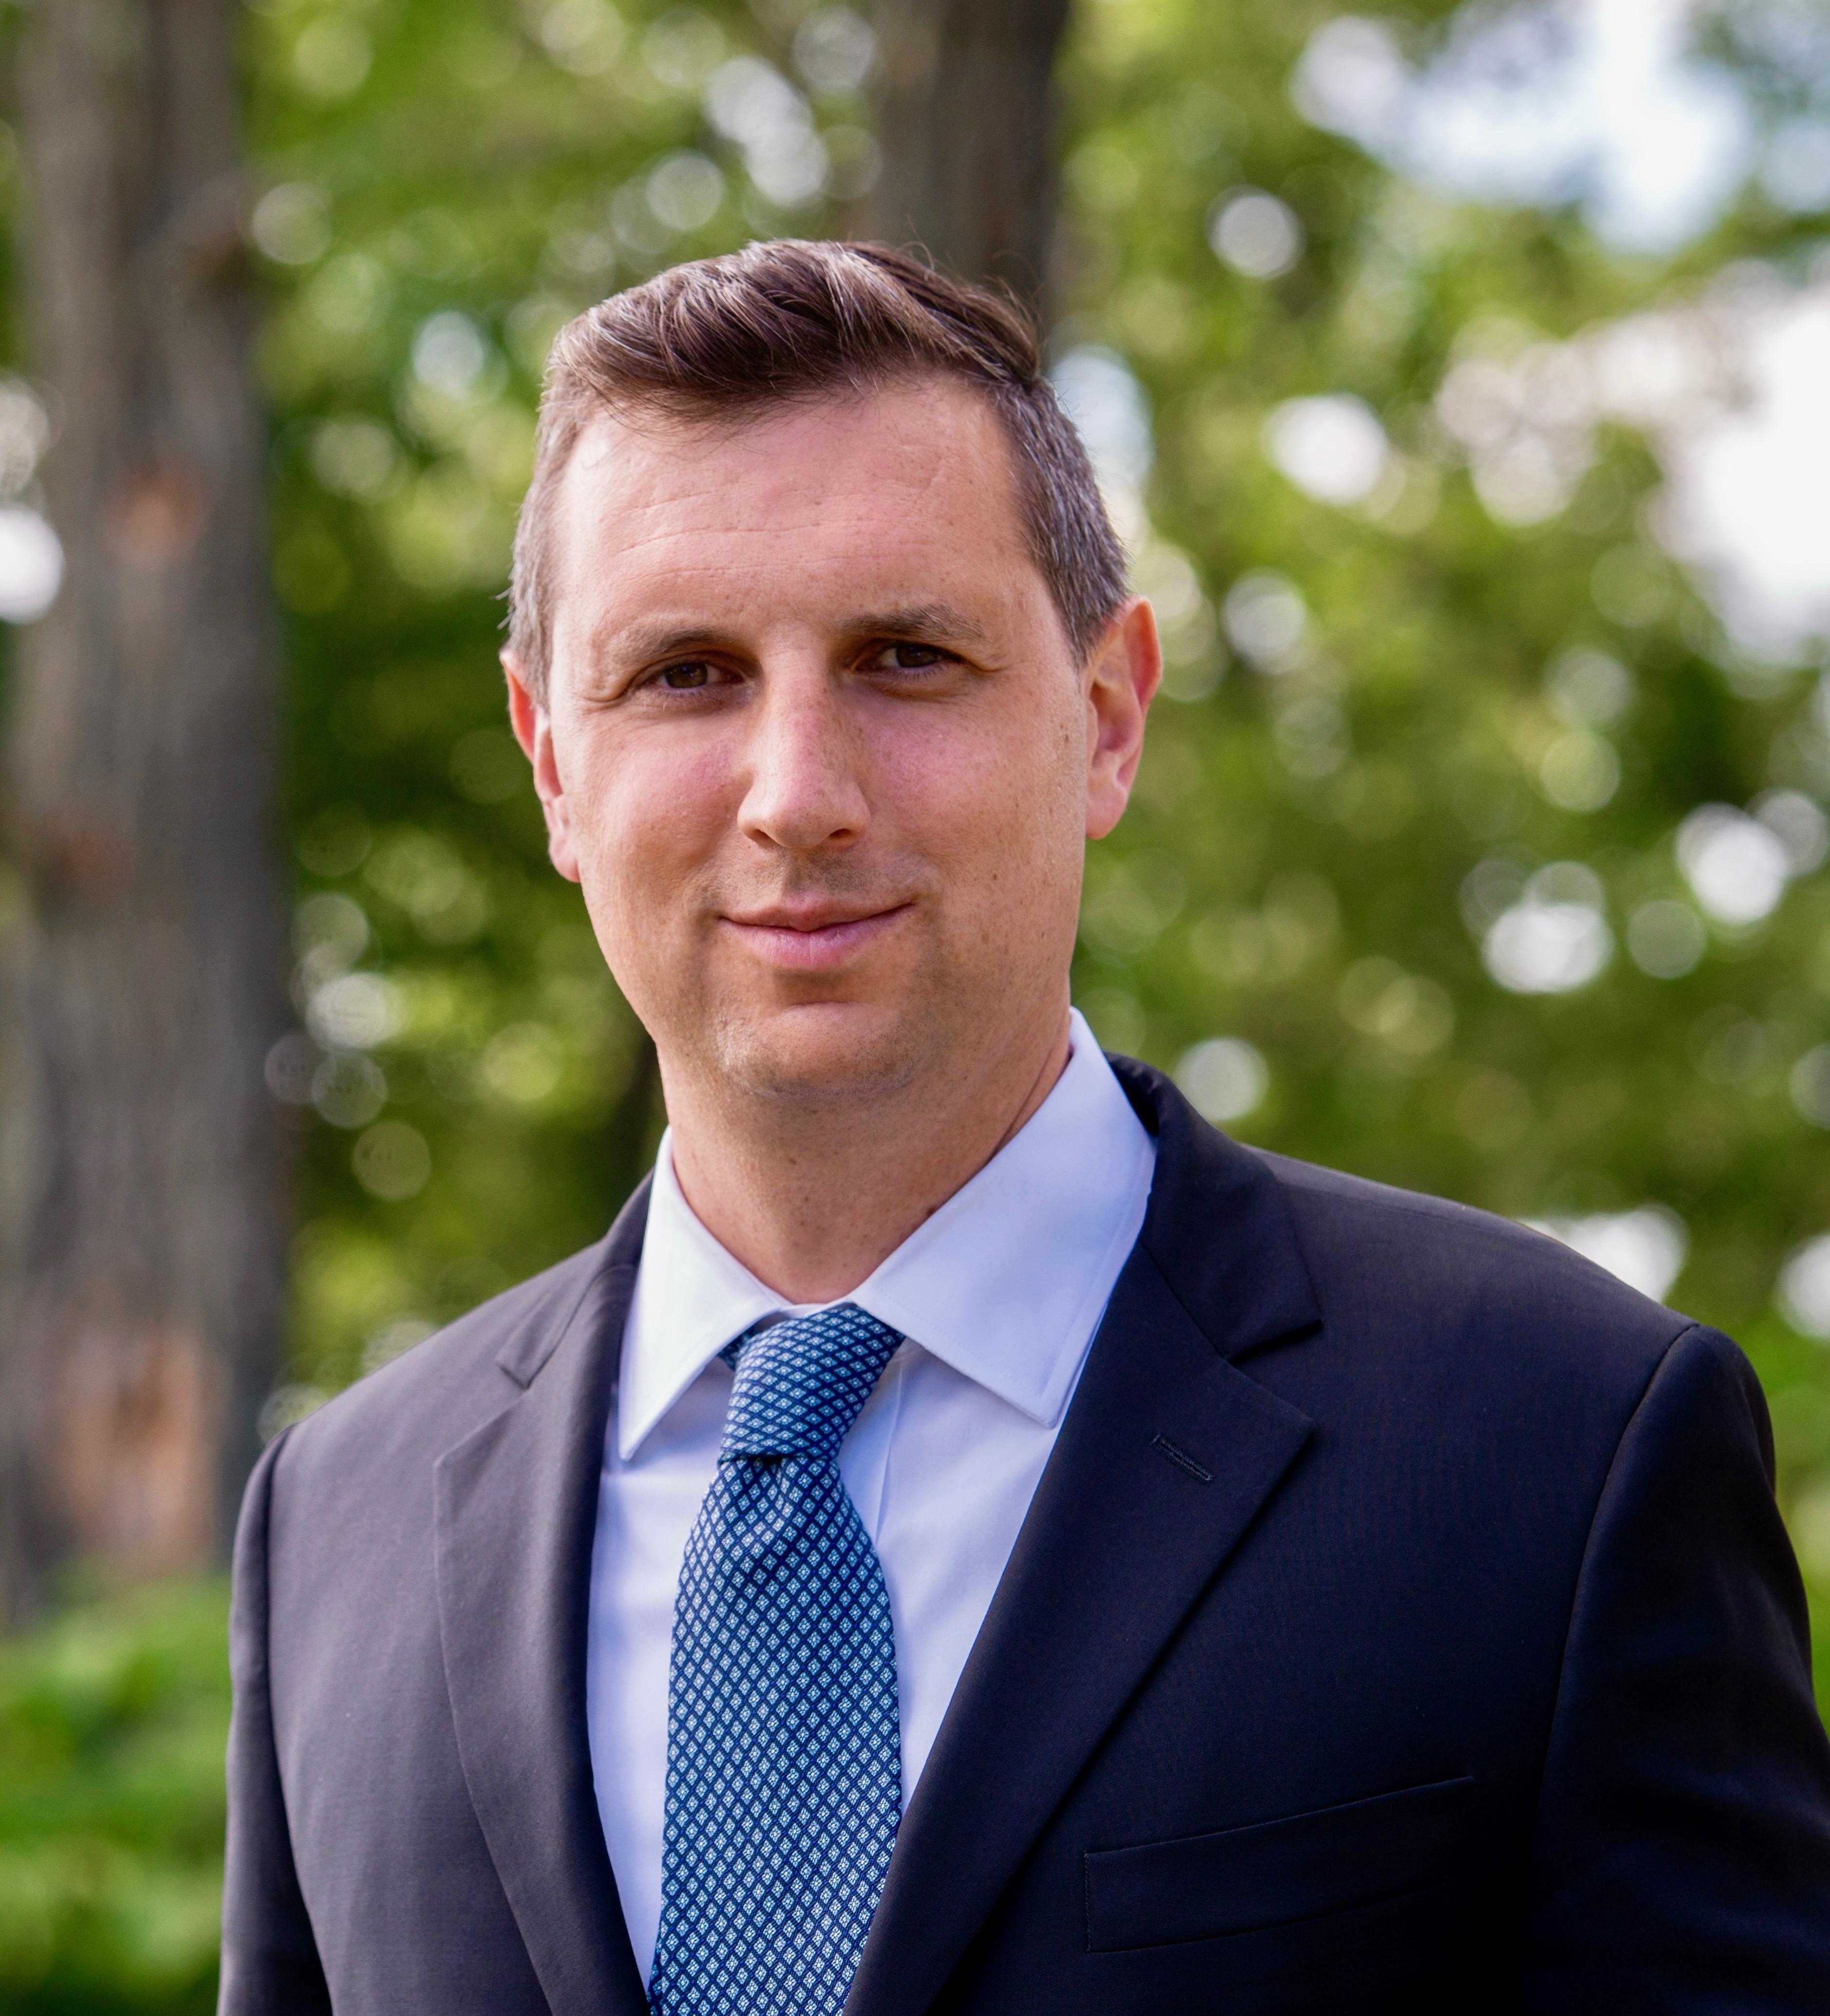 General Treasurer Seth Magaziner